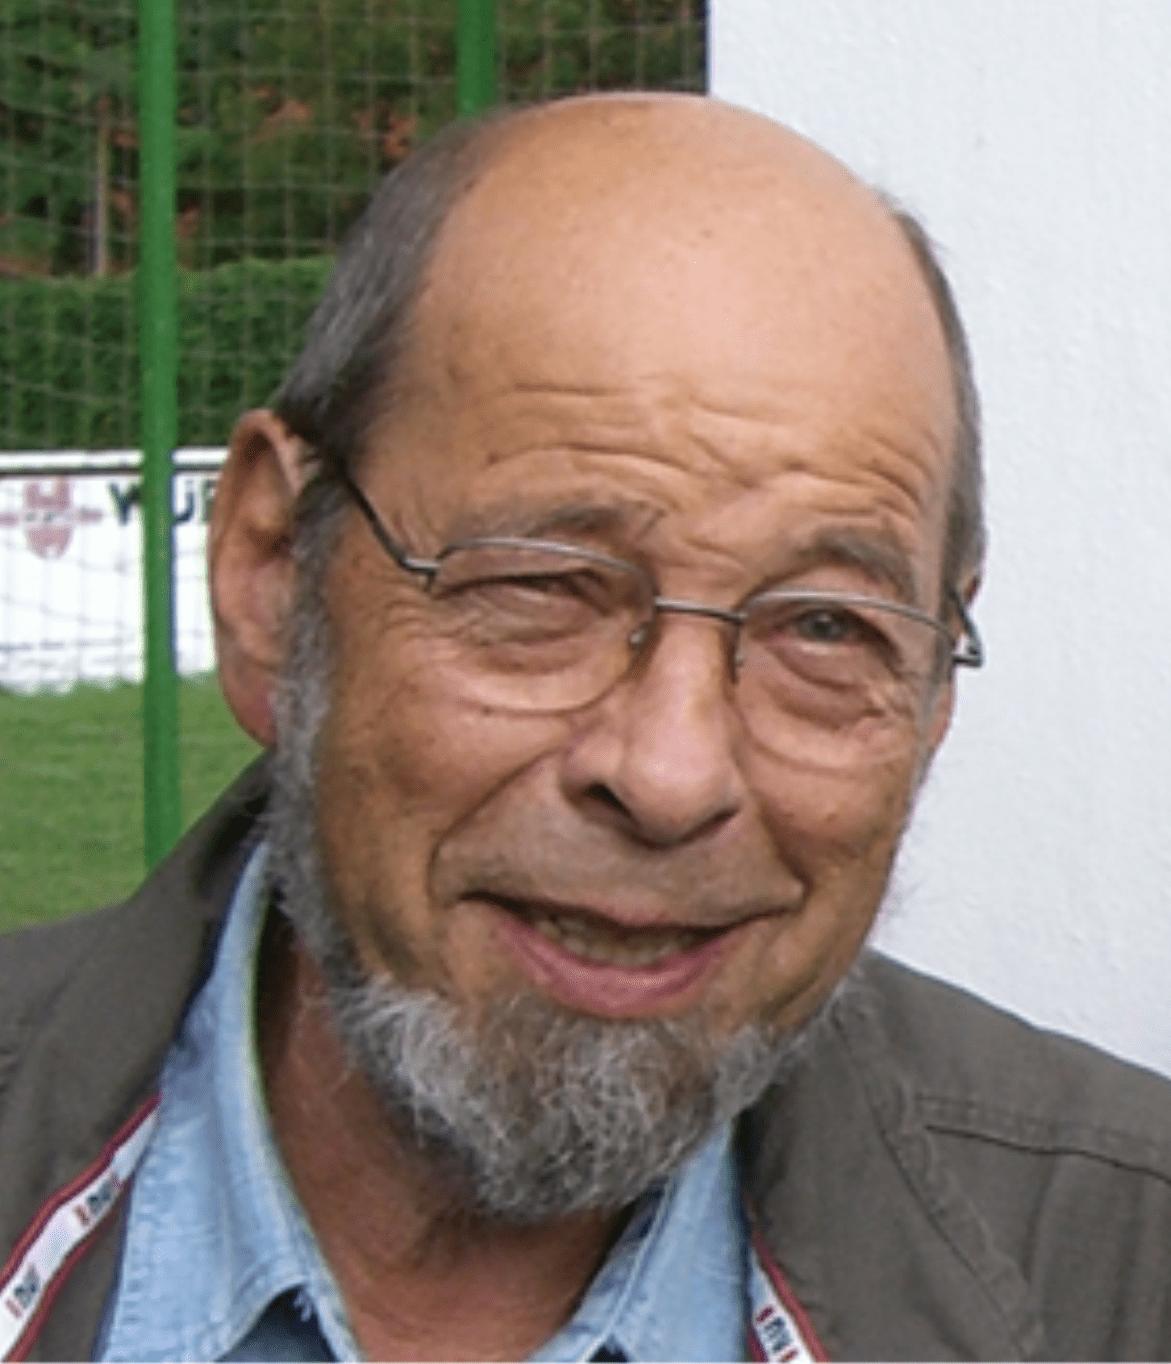 Martin Hampejs